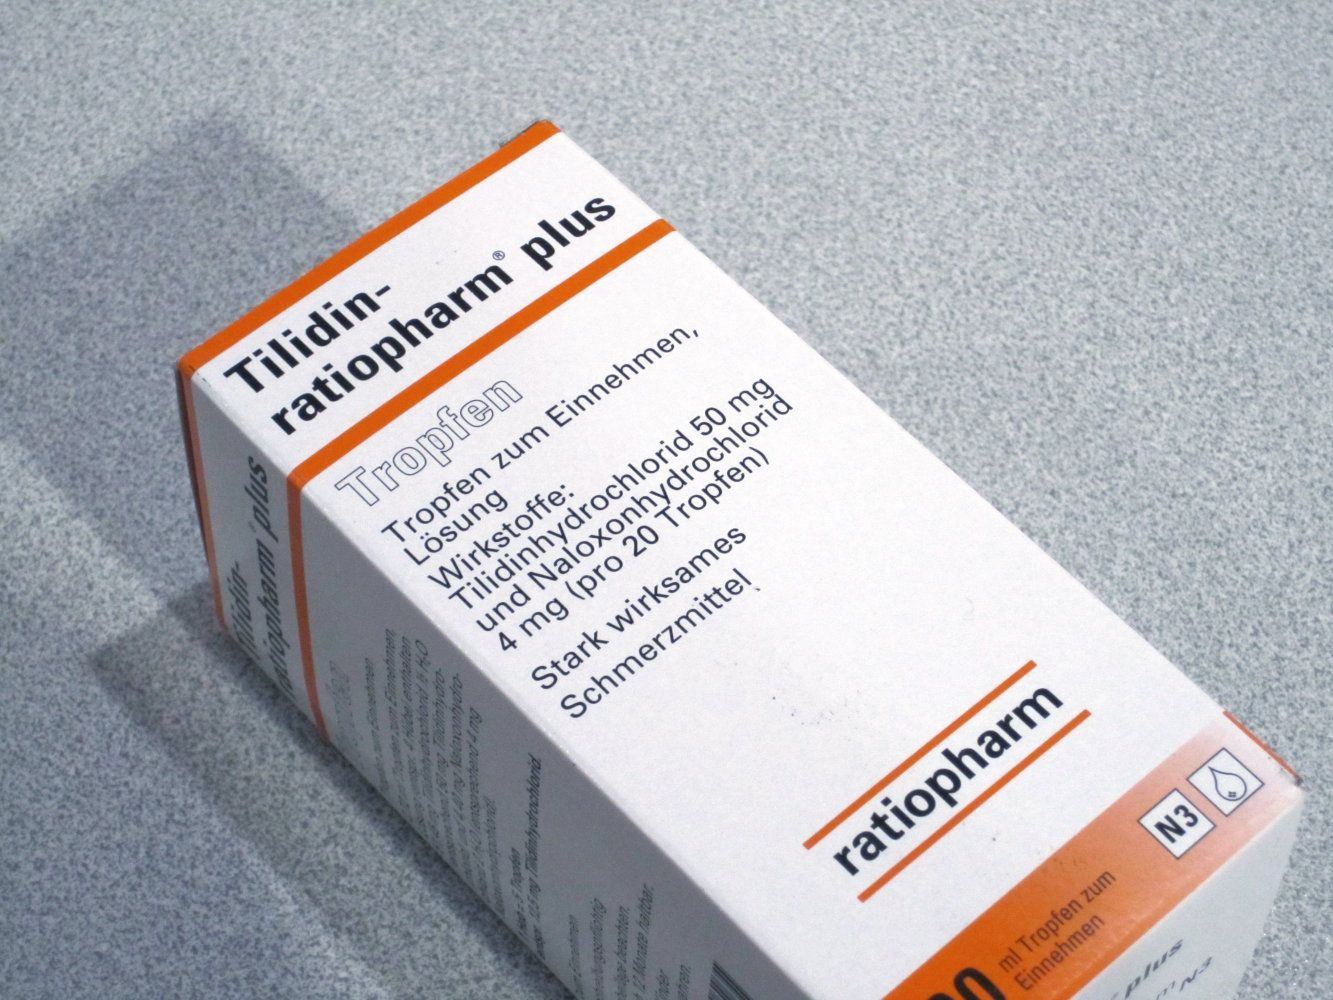 Wechselwirkung ibuprofen tilidin Novaminsulfon mit